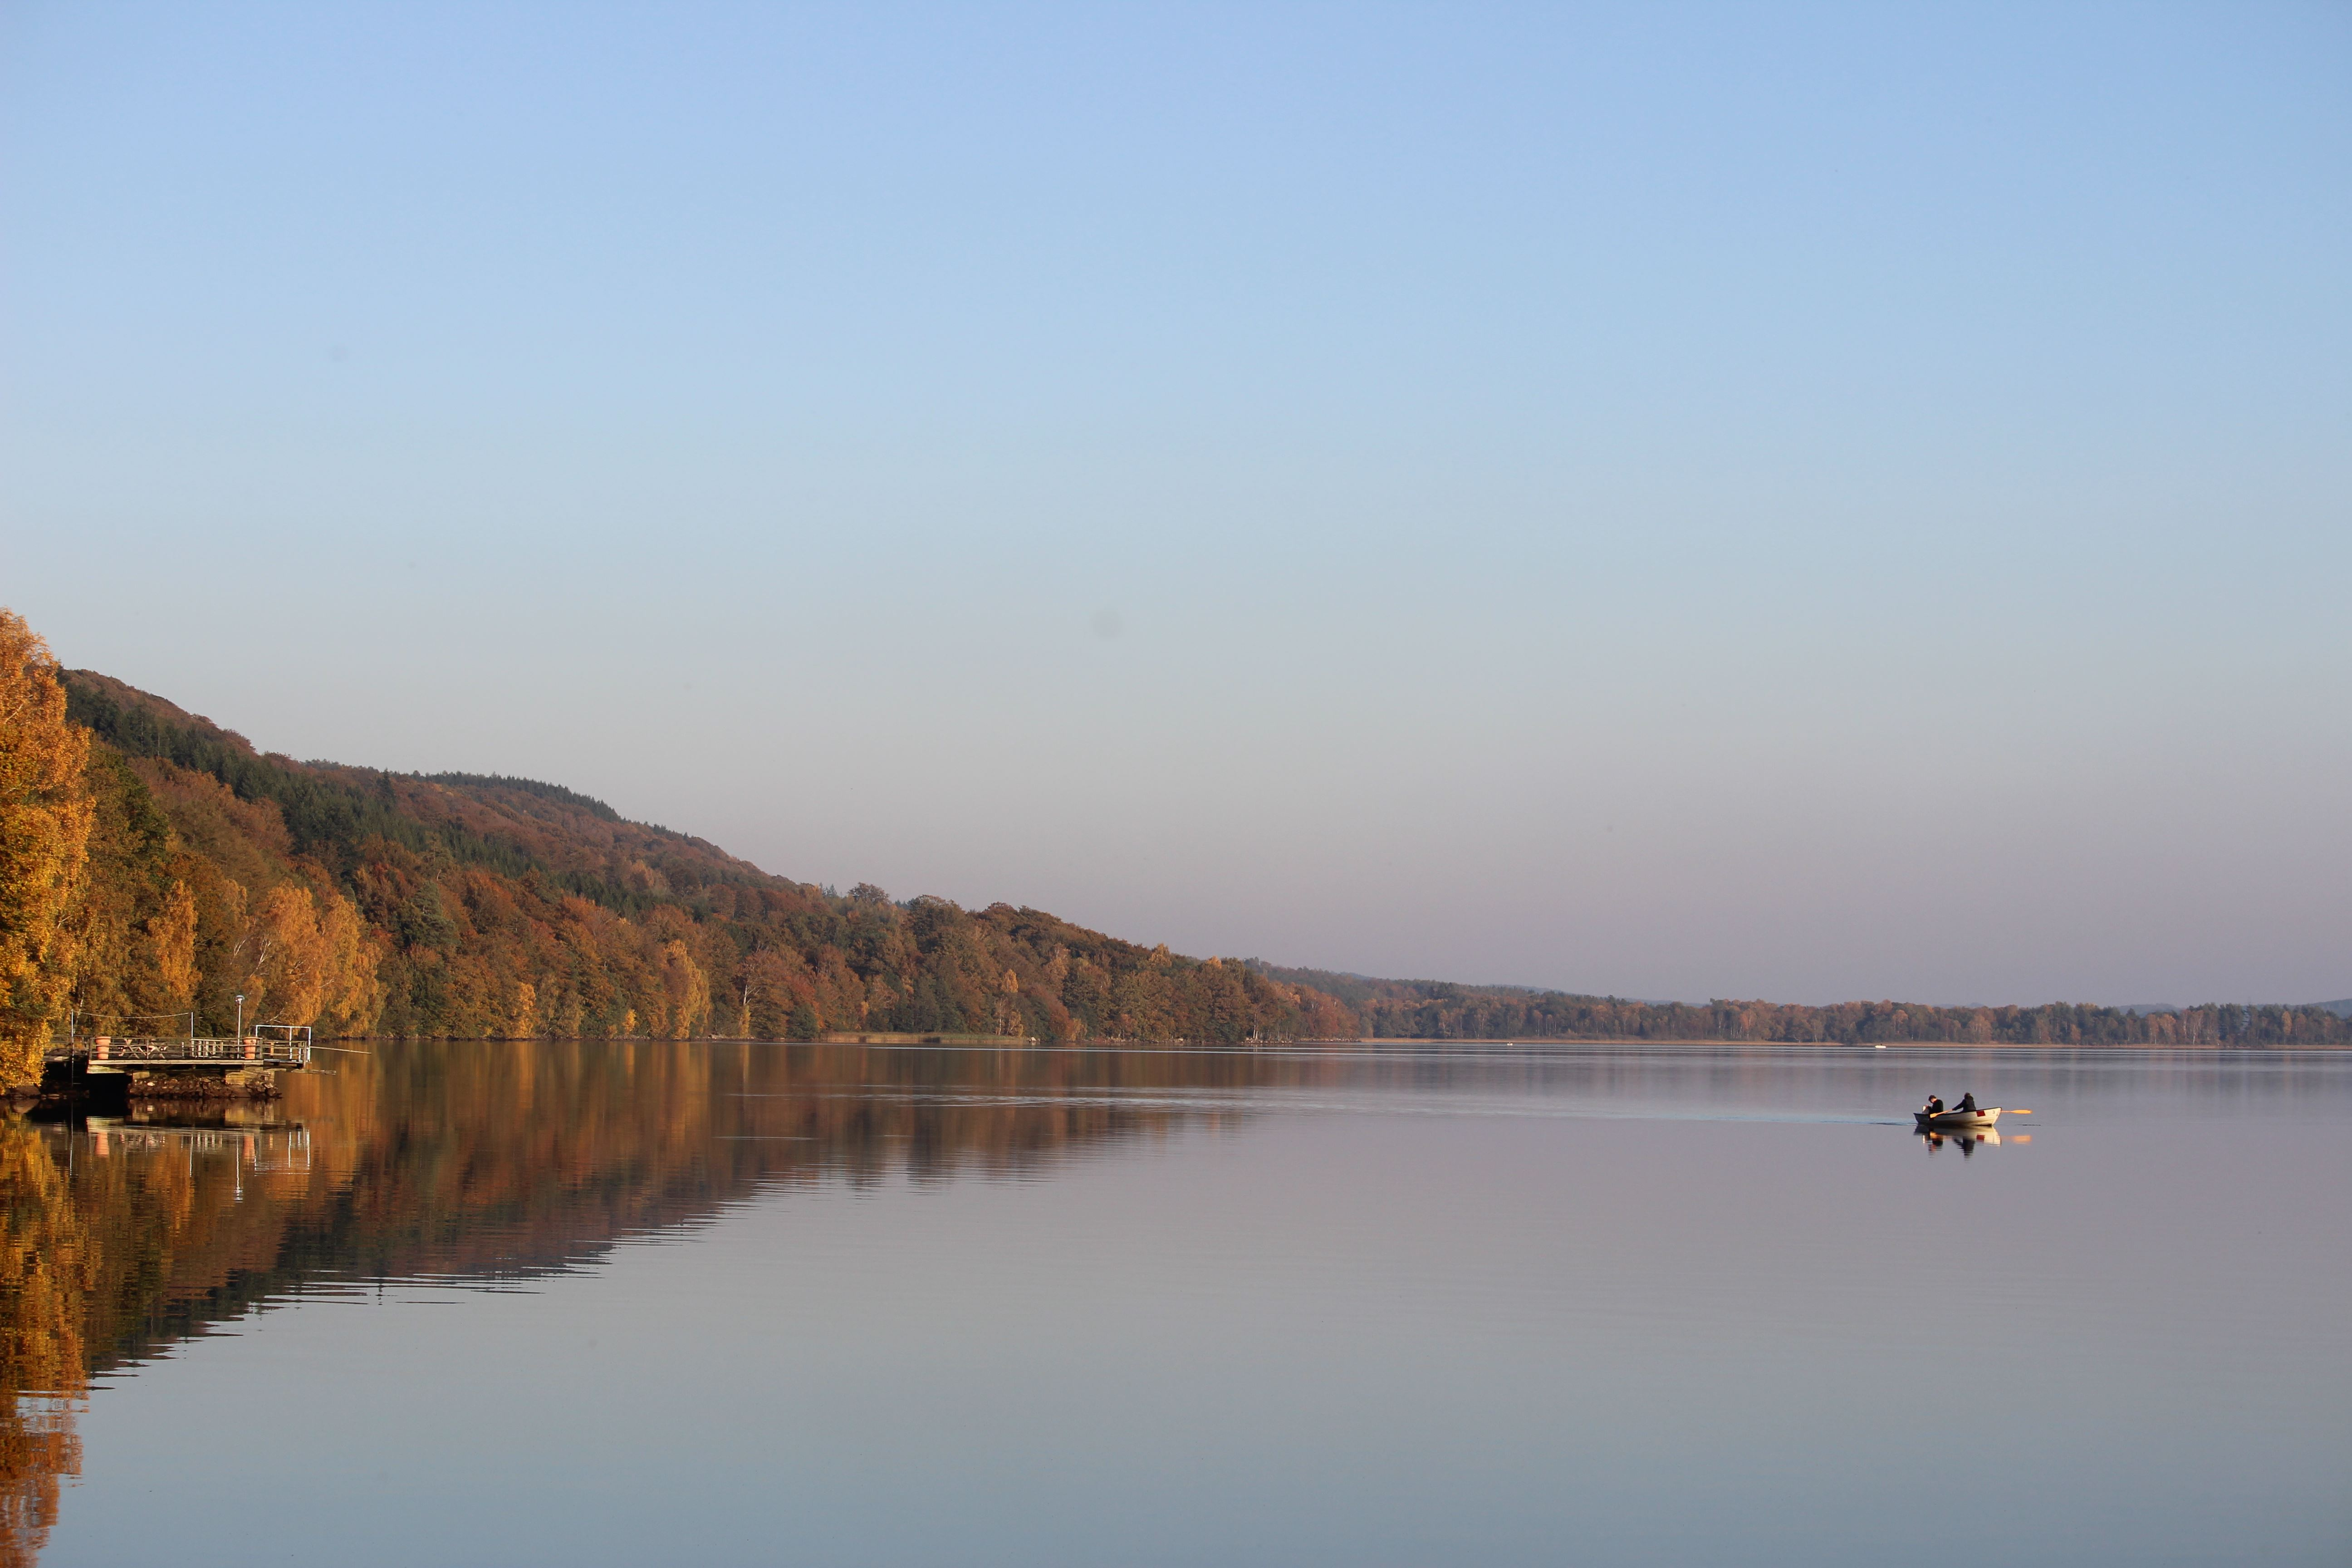 Västersjön